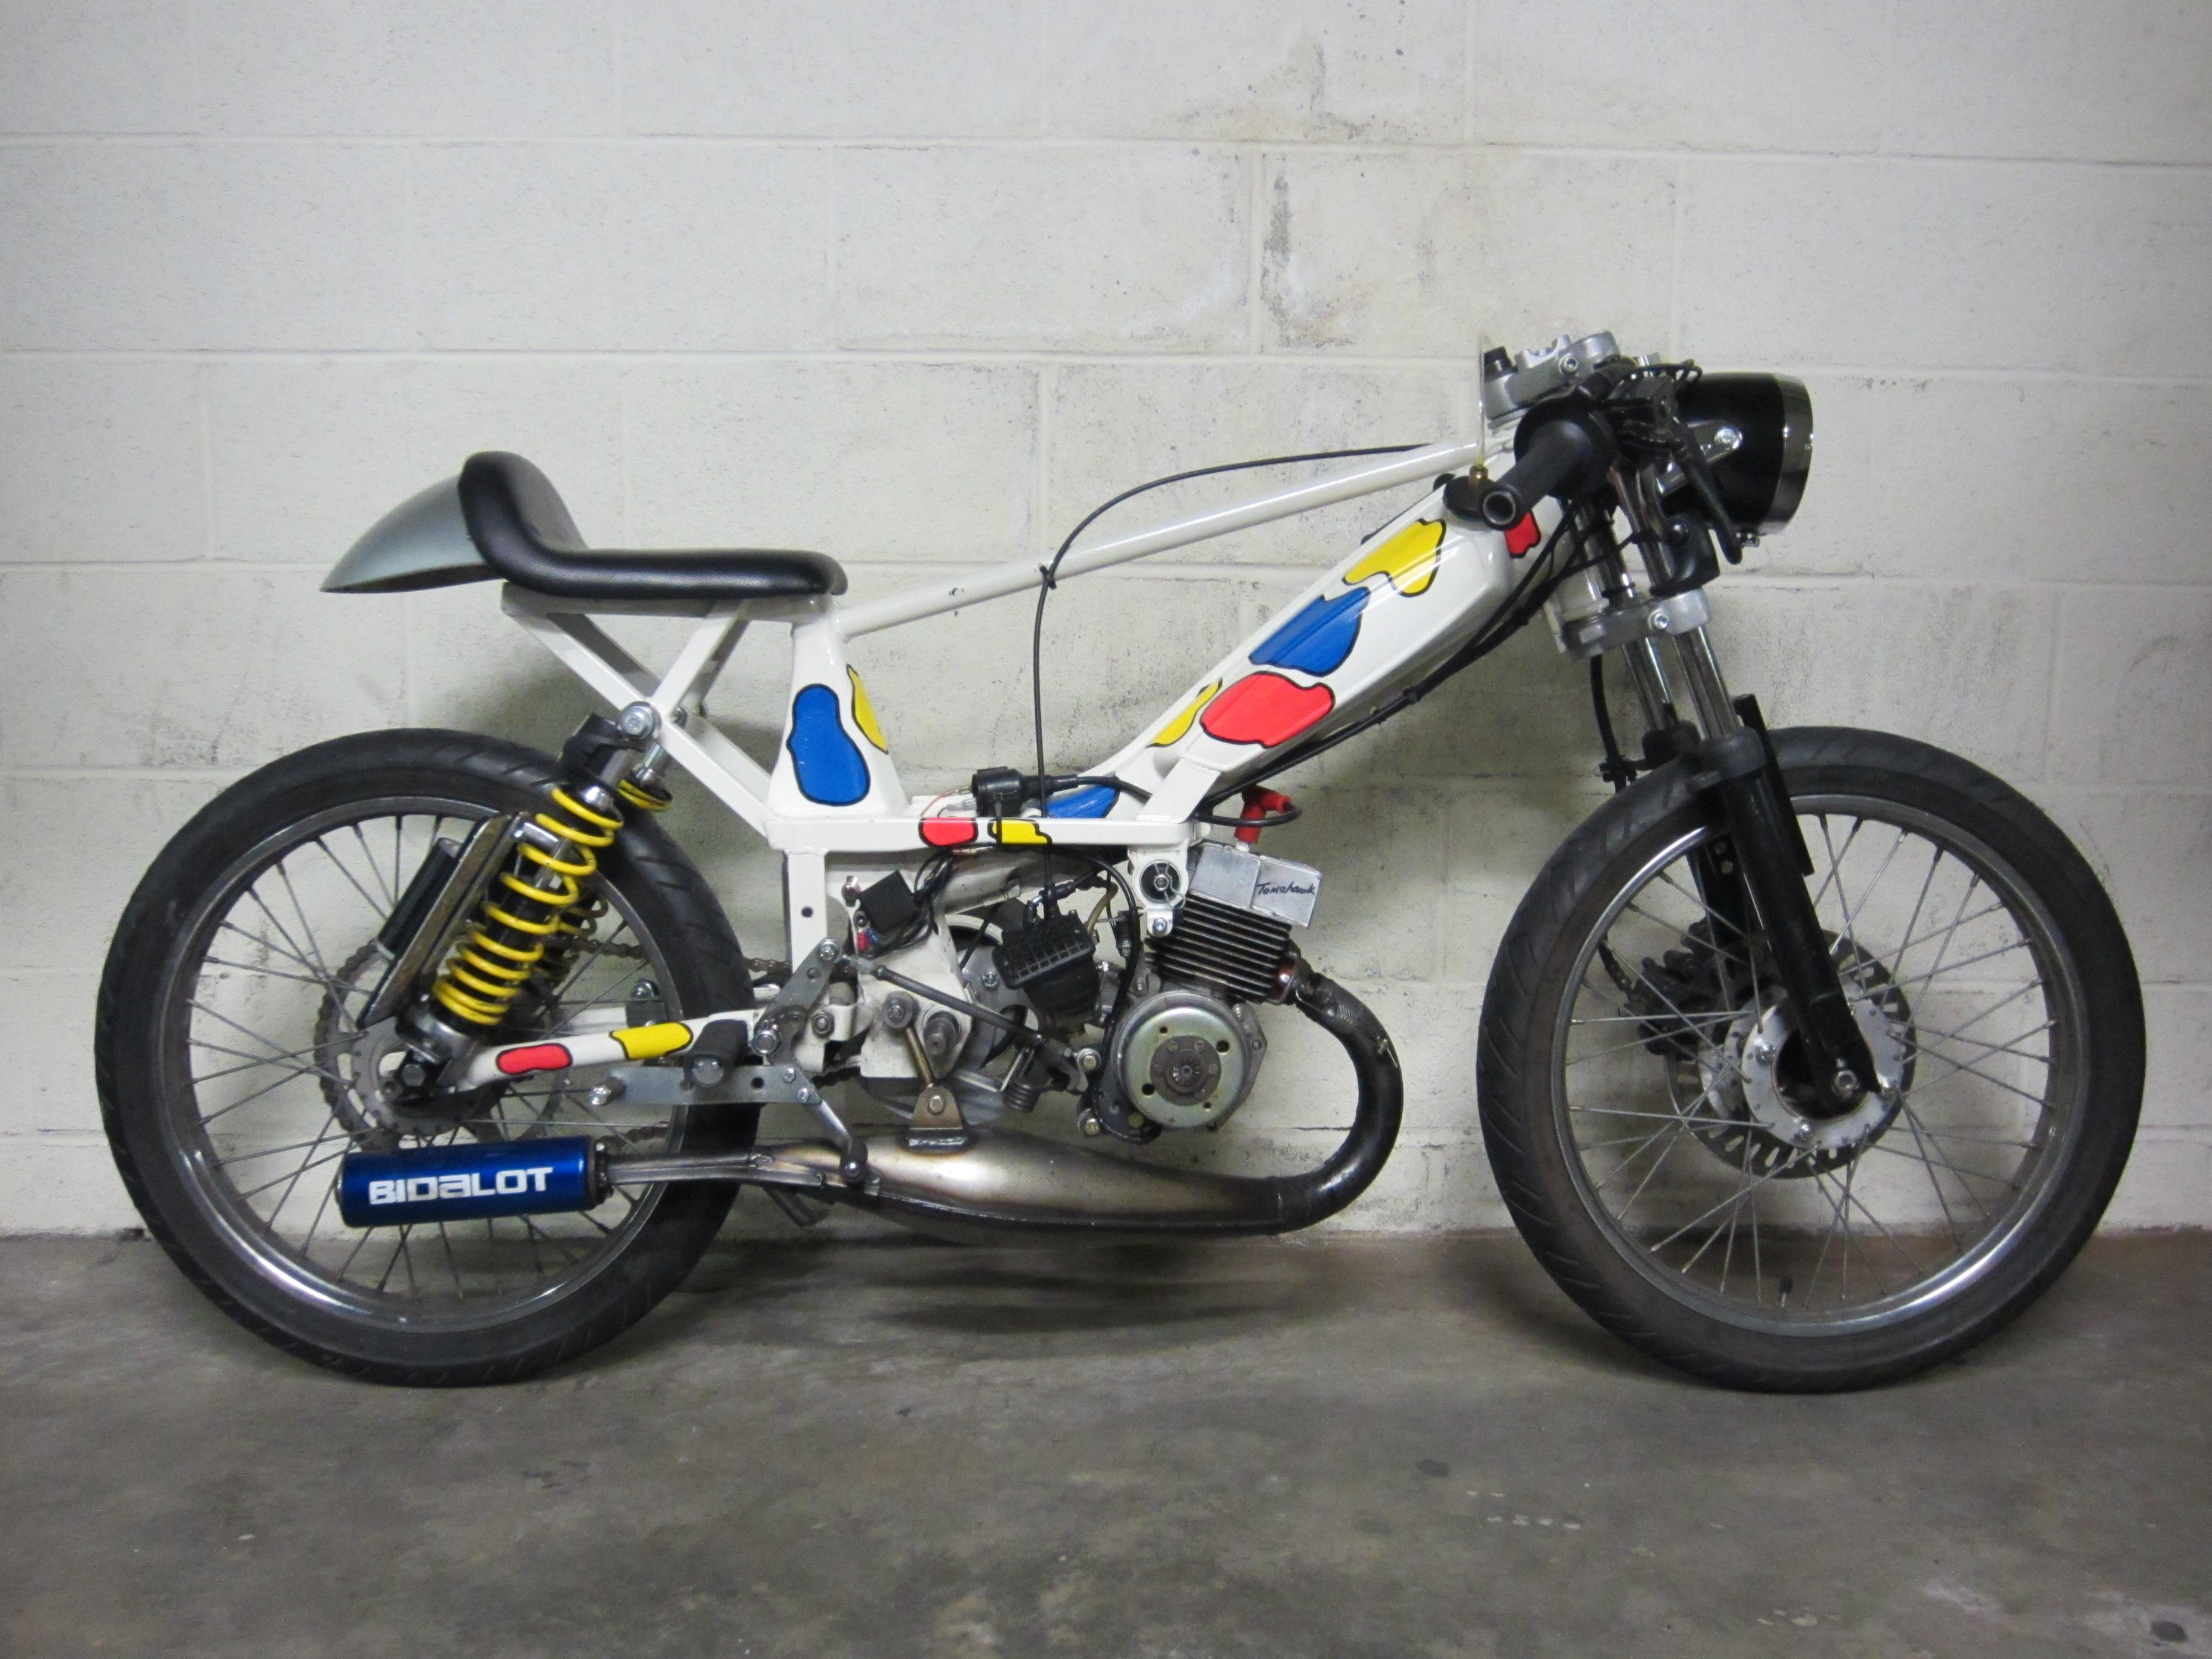 Tomos sprint moped